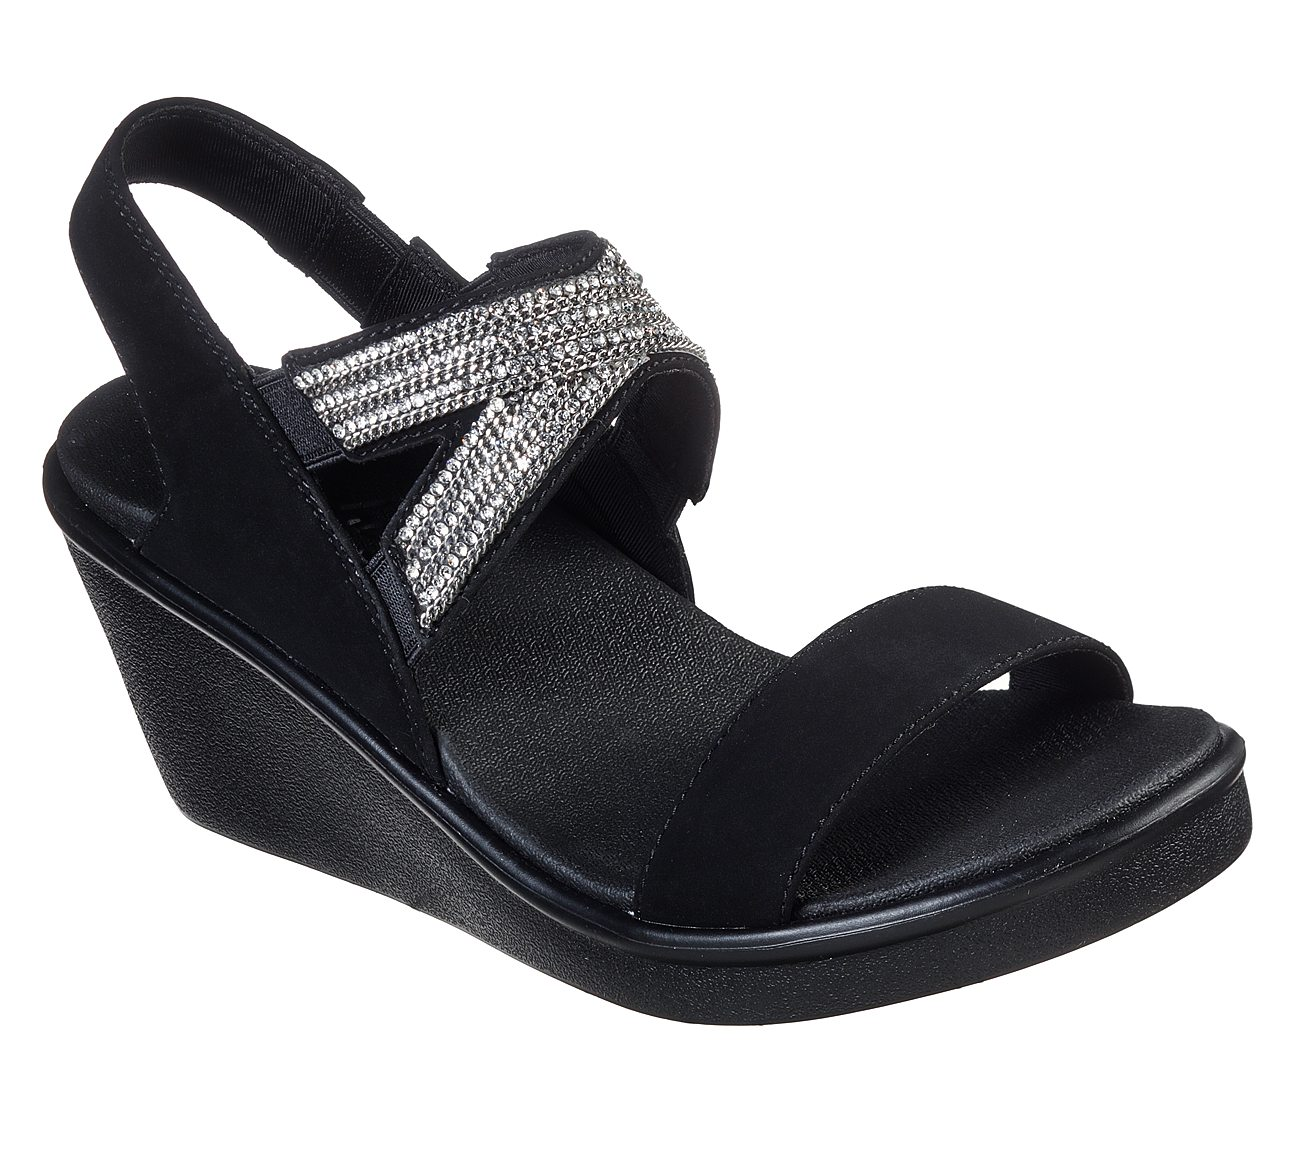 Articulación oler Indefinido  Buy SKECHERS Rumble On - Chart Topper SKECHERS Cali Shoes